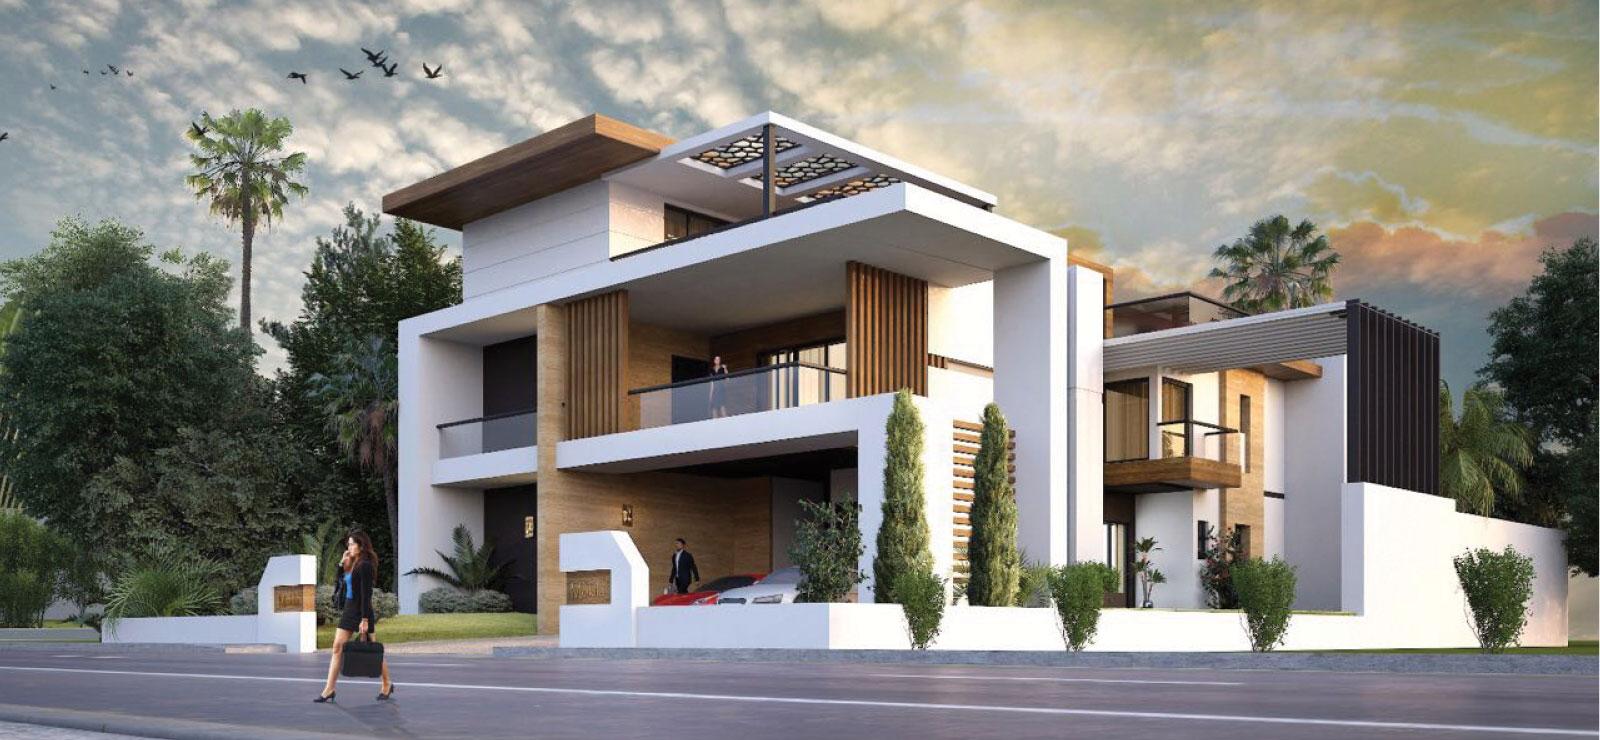 Ananth Kumar's Residence